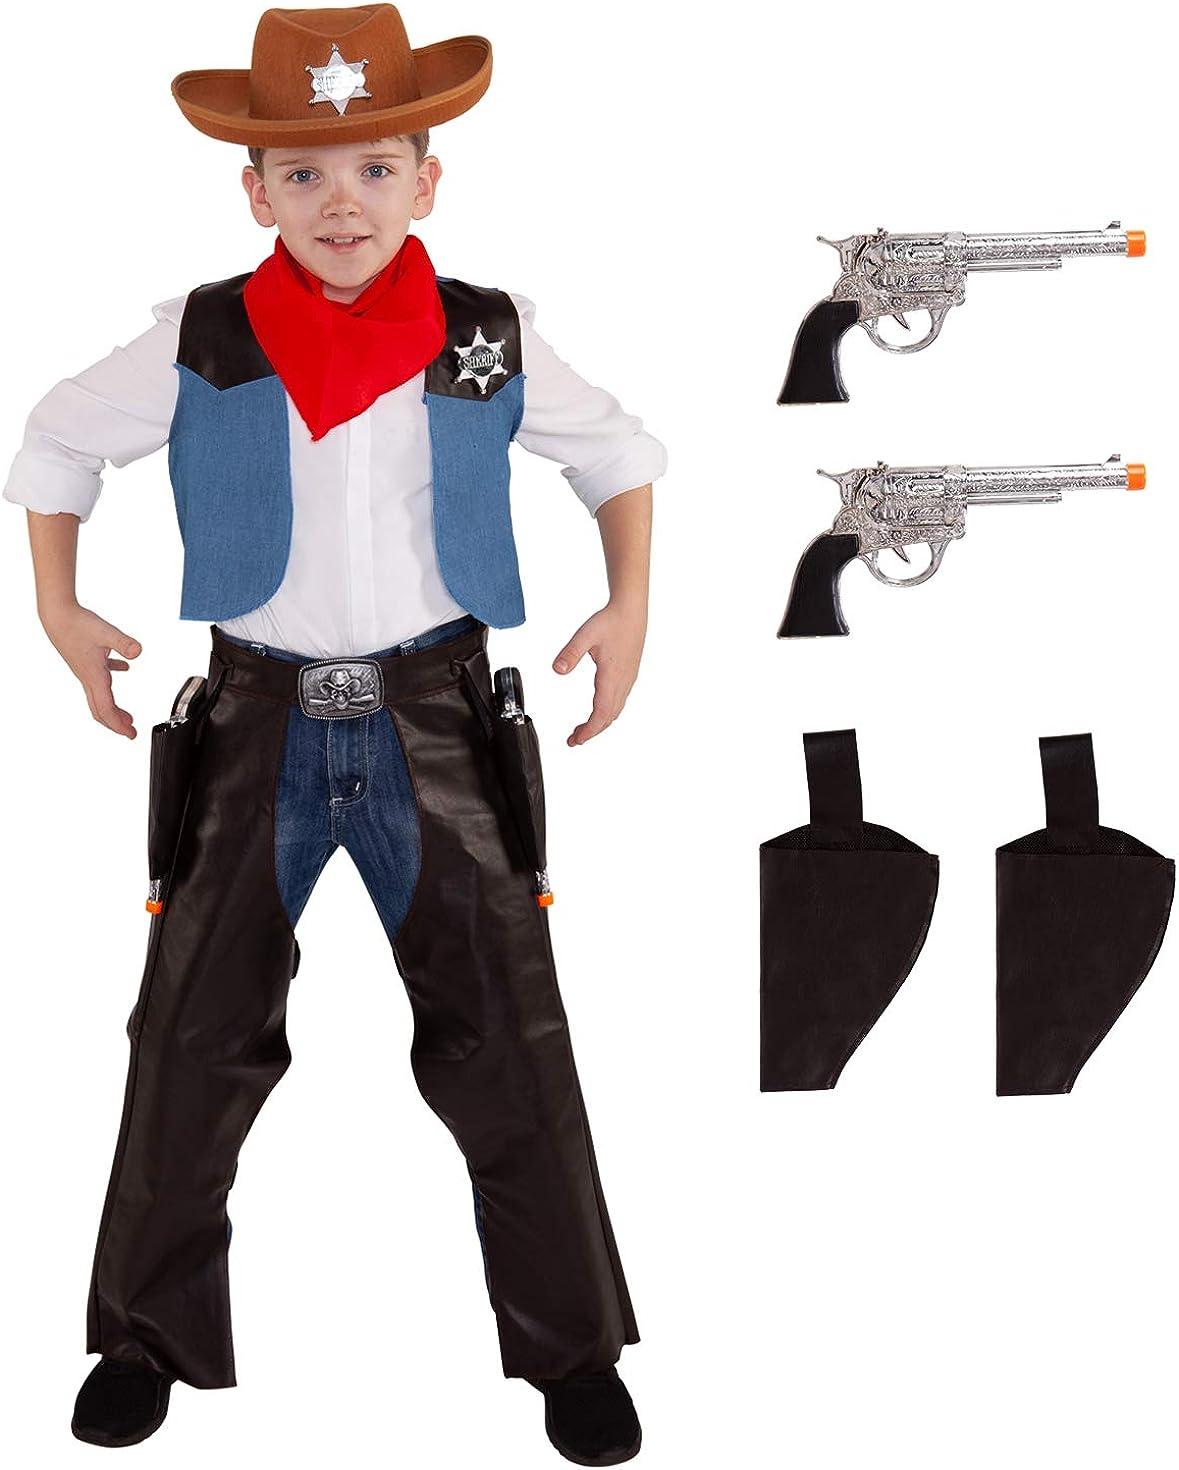 New Cowgirl Cowboy Fancy Dress Costume Boys Girls Childs Wild West Western Kids